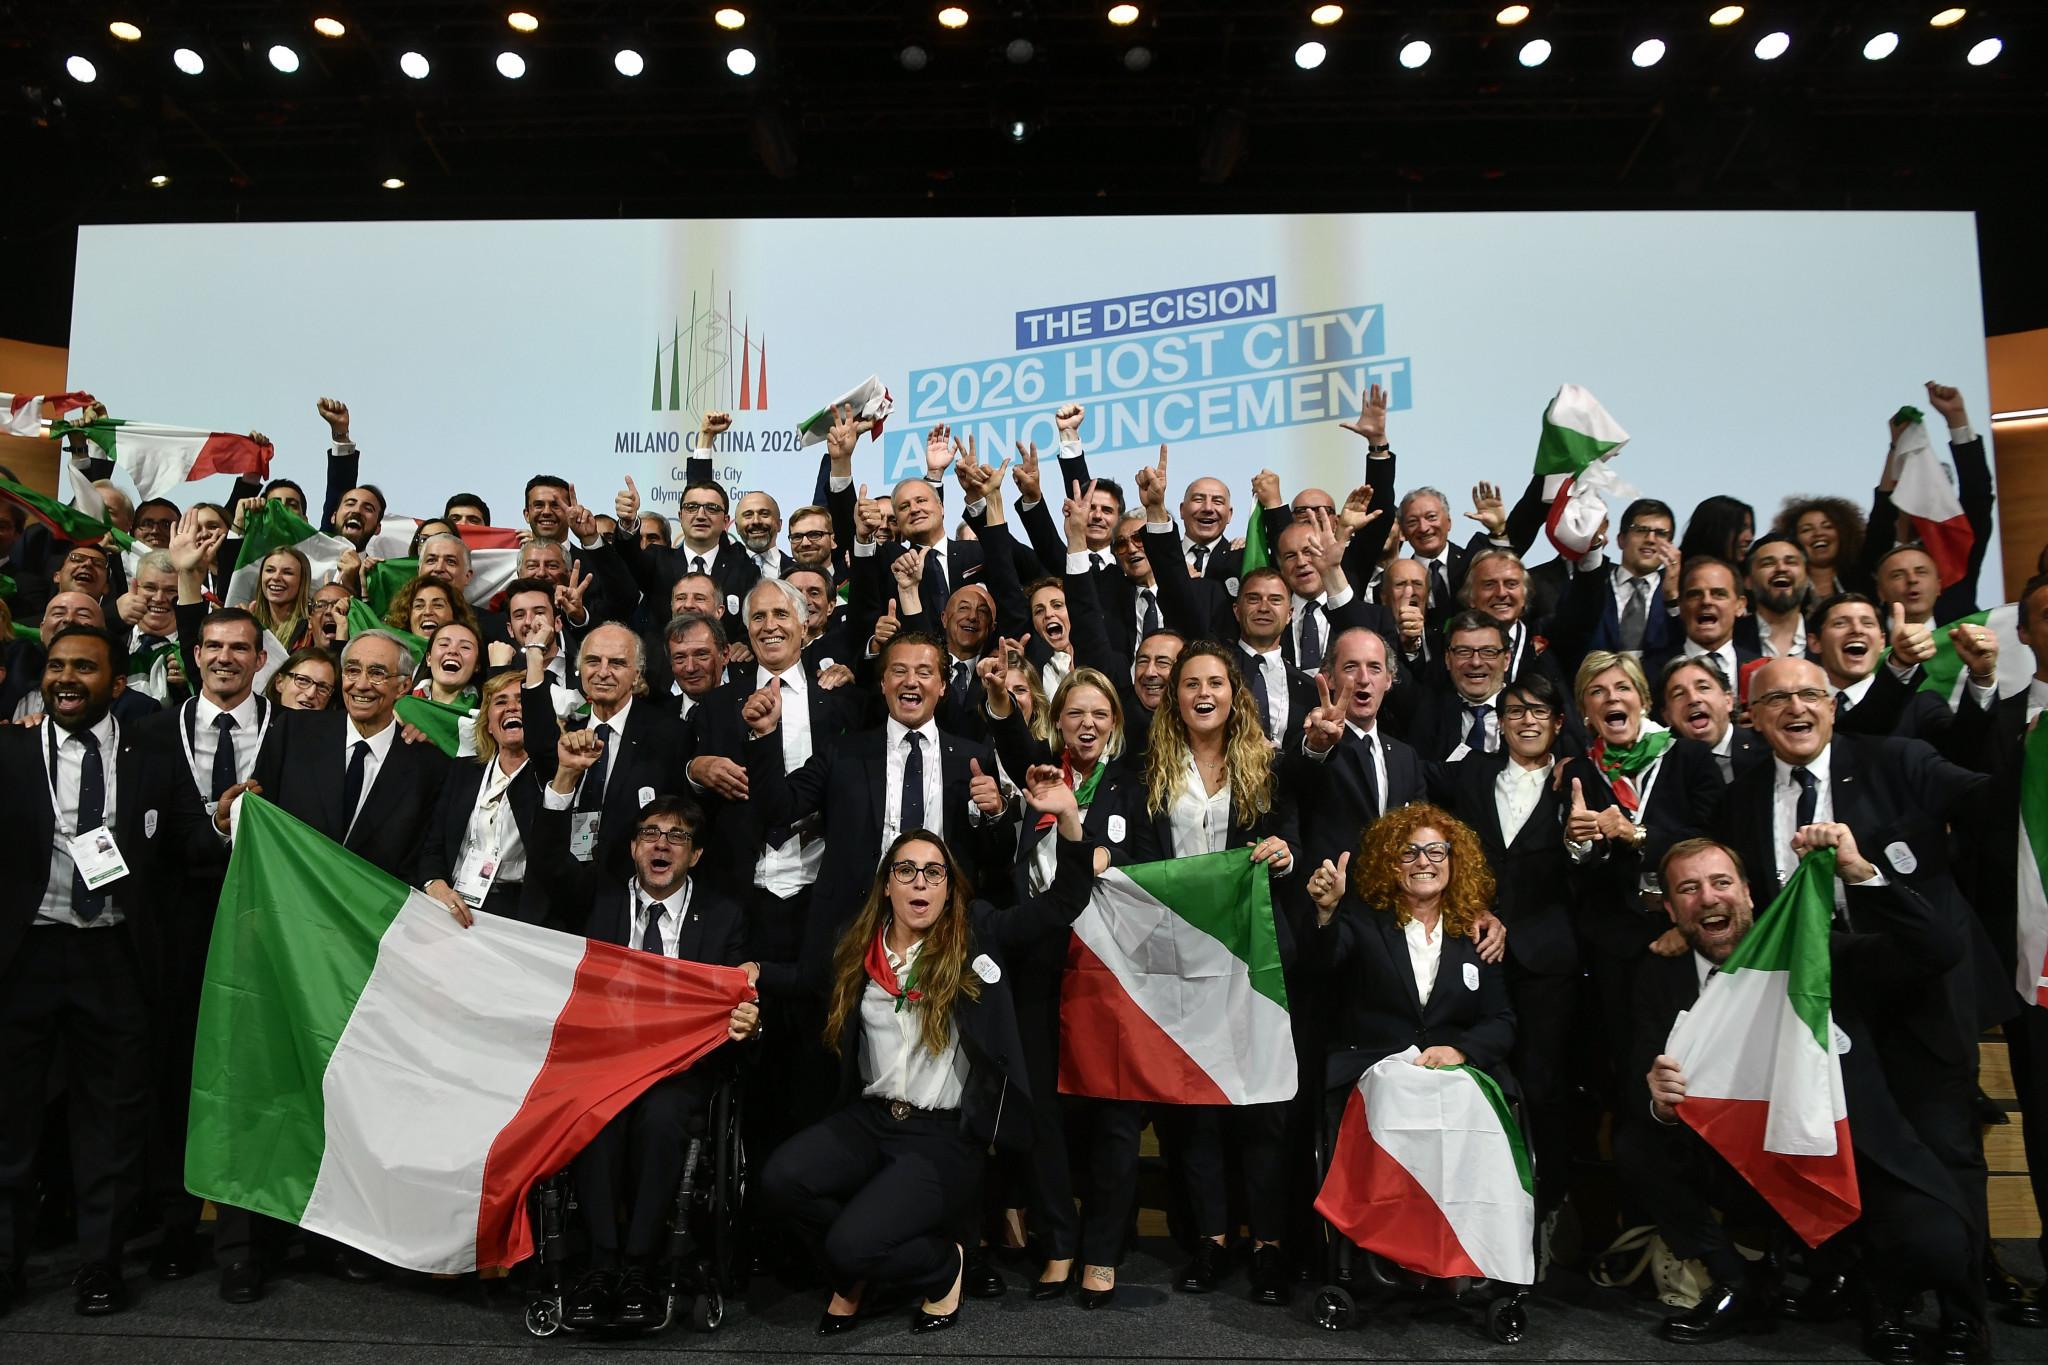 Milan Cortina 2026 Organising Committee established as IOC visit begins